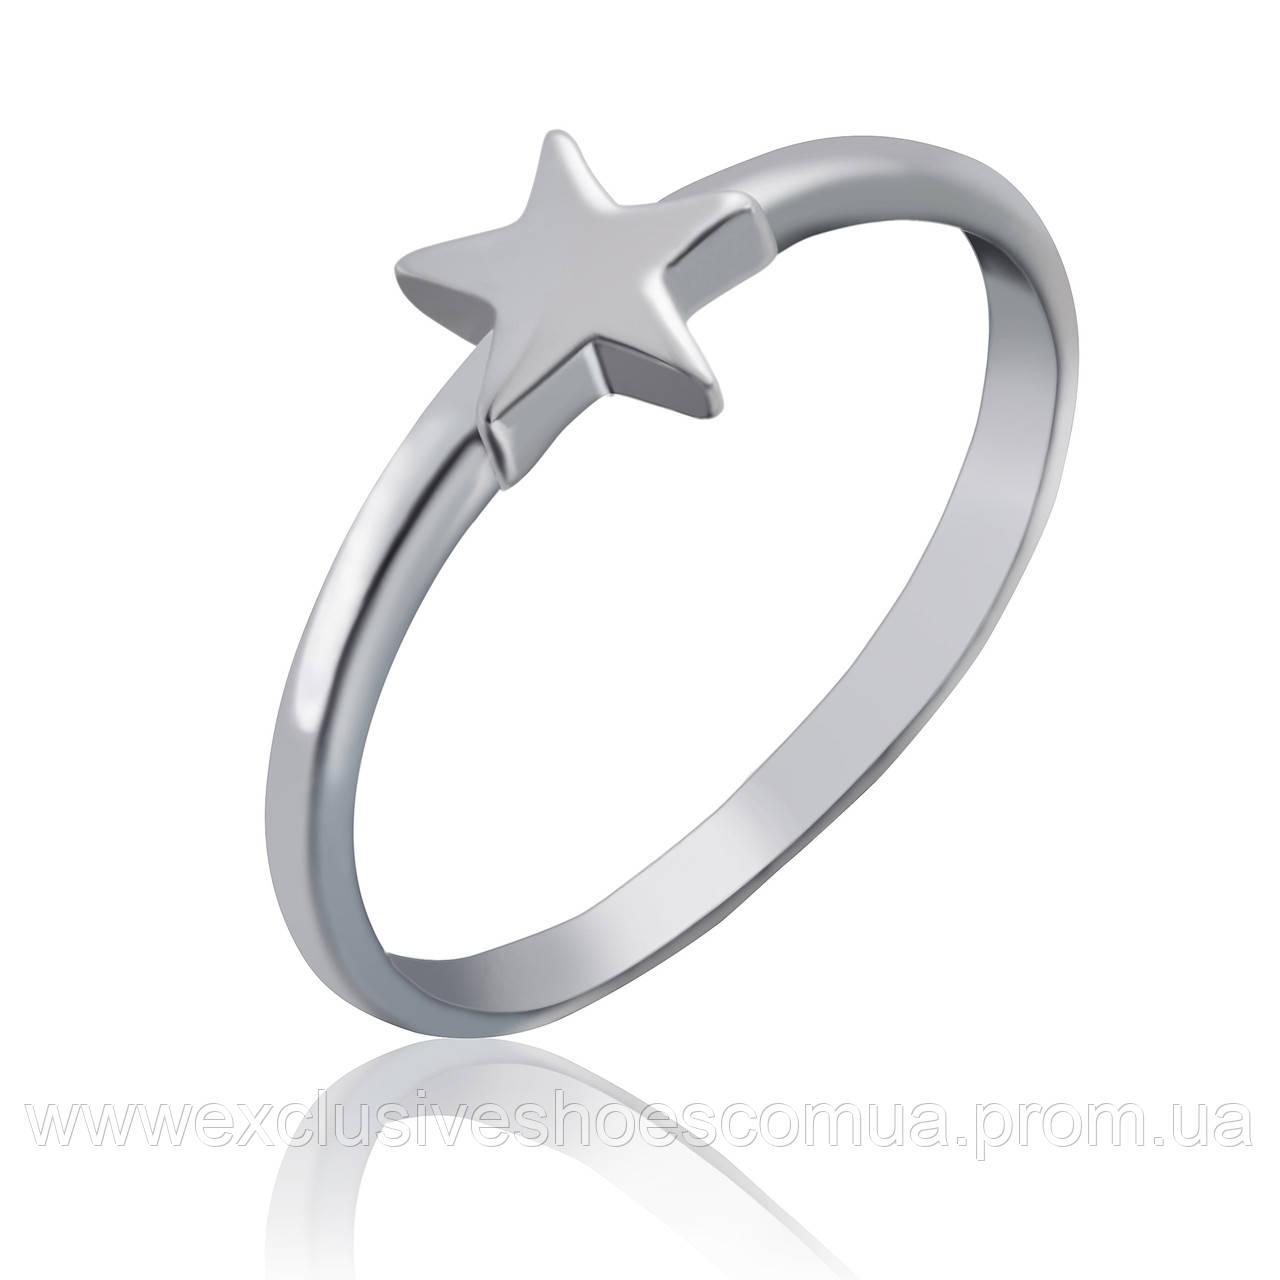 Серебряное кольцо со звездочкой, арт-910112